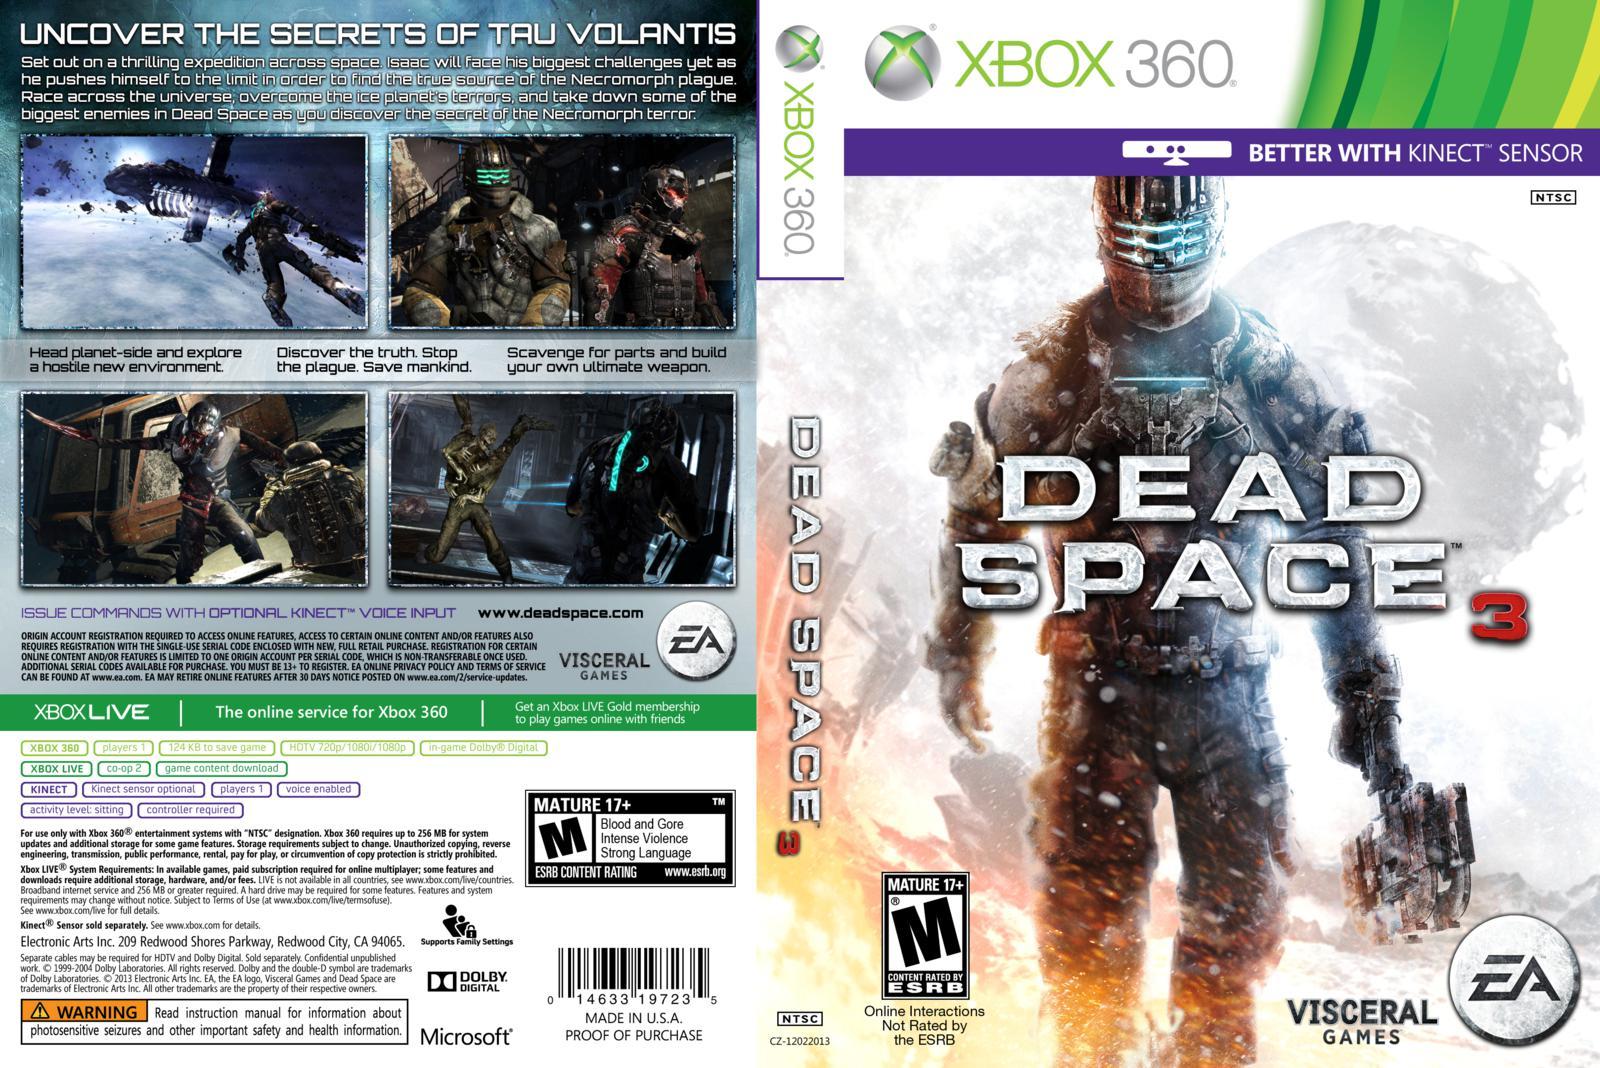 Capa Scan Capa Cover Caratula Xbox360 Dead Space 3